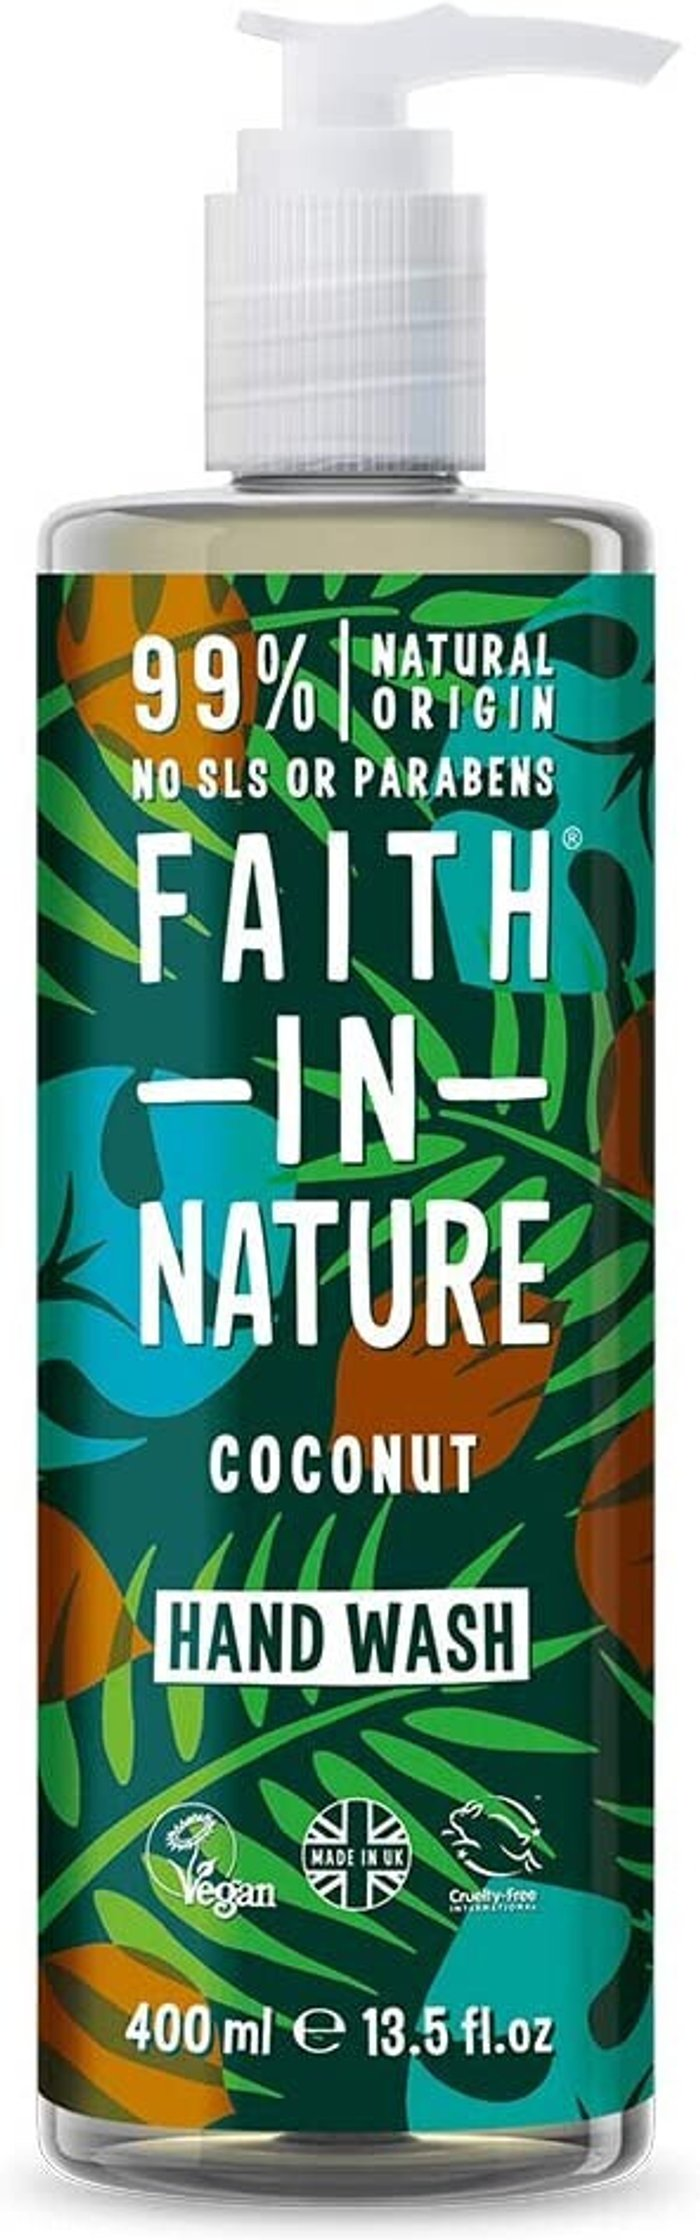 Faith in Nature Faith in Nature Coconut Hand Wash 400ml